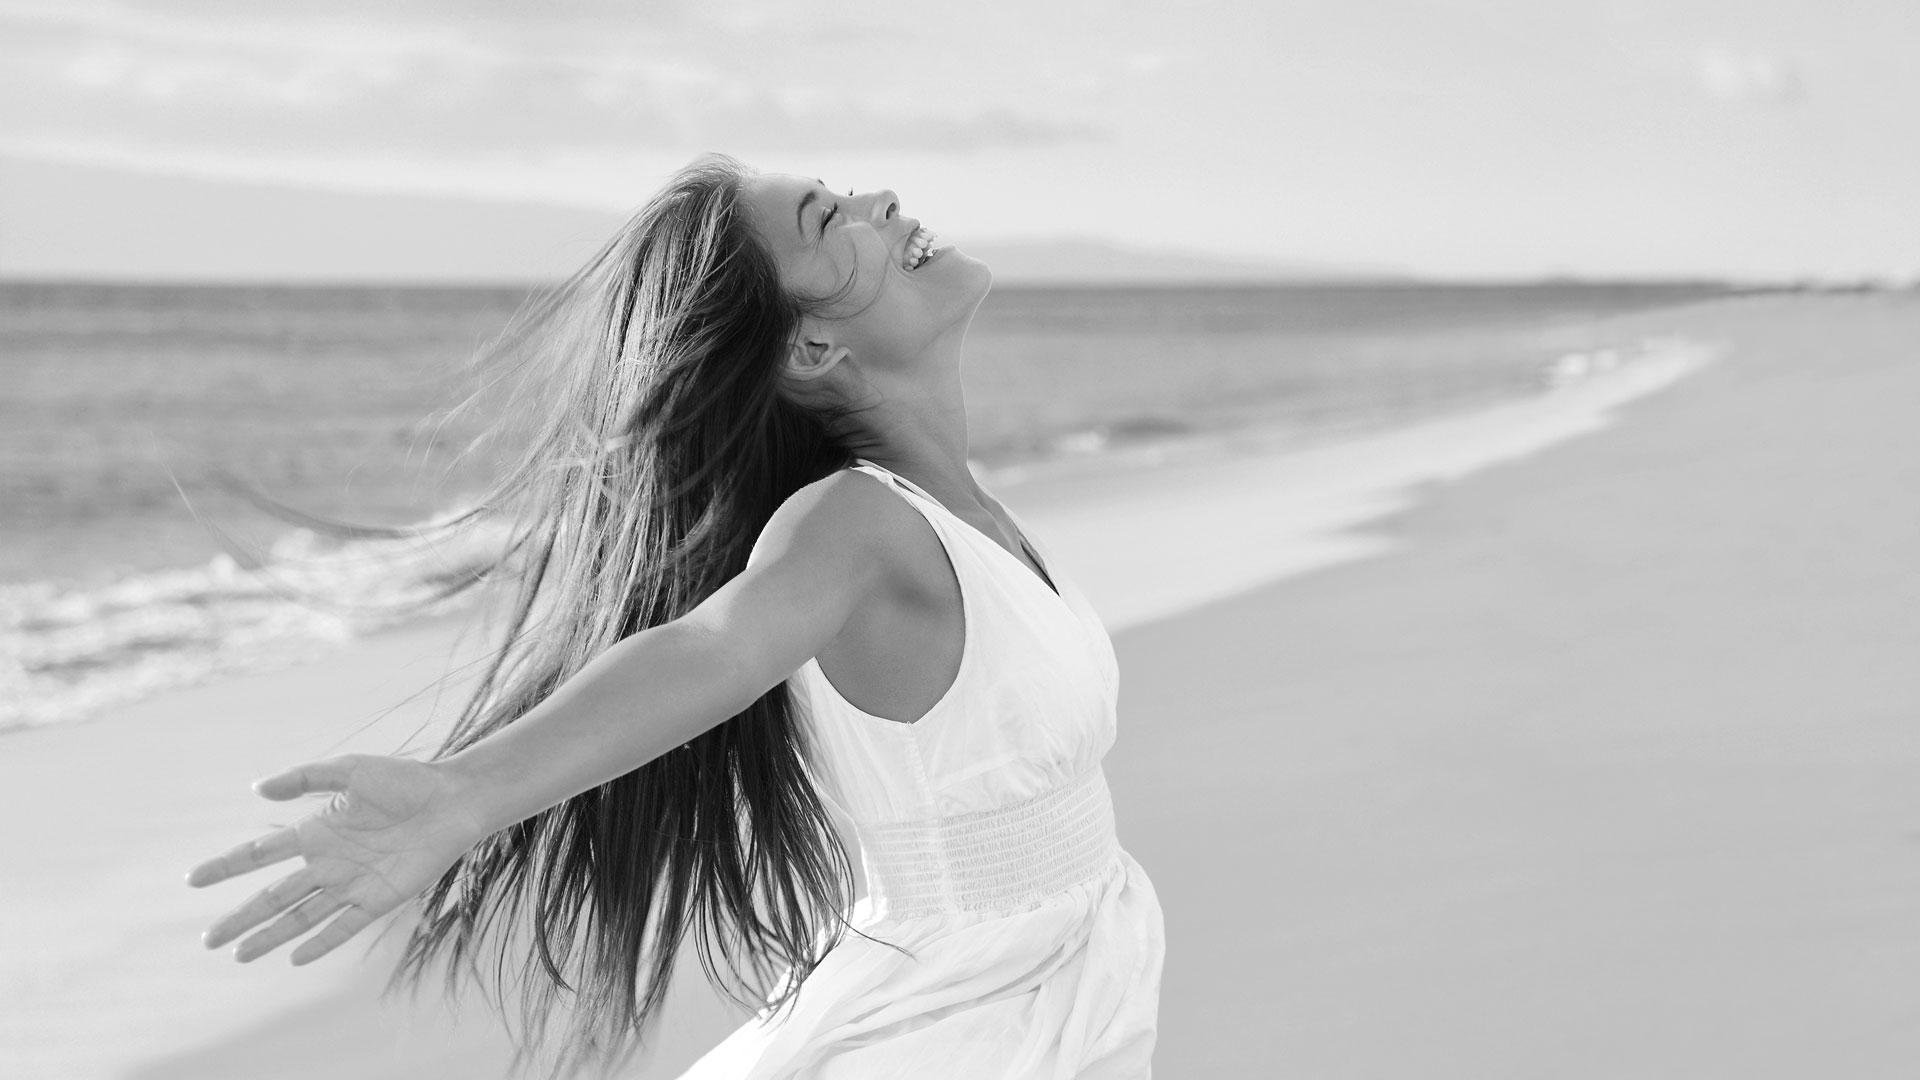 the most advanced non-invasive system for skin rejuvenation